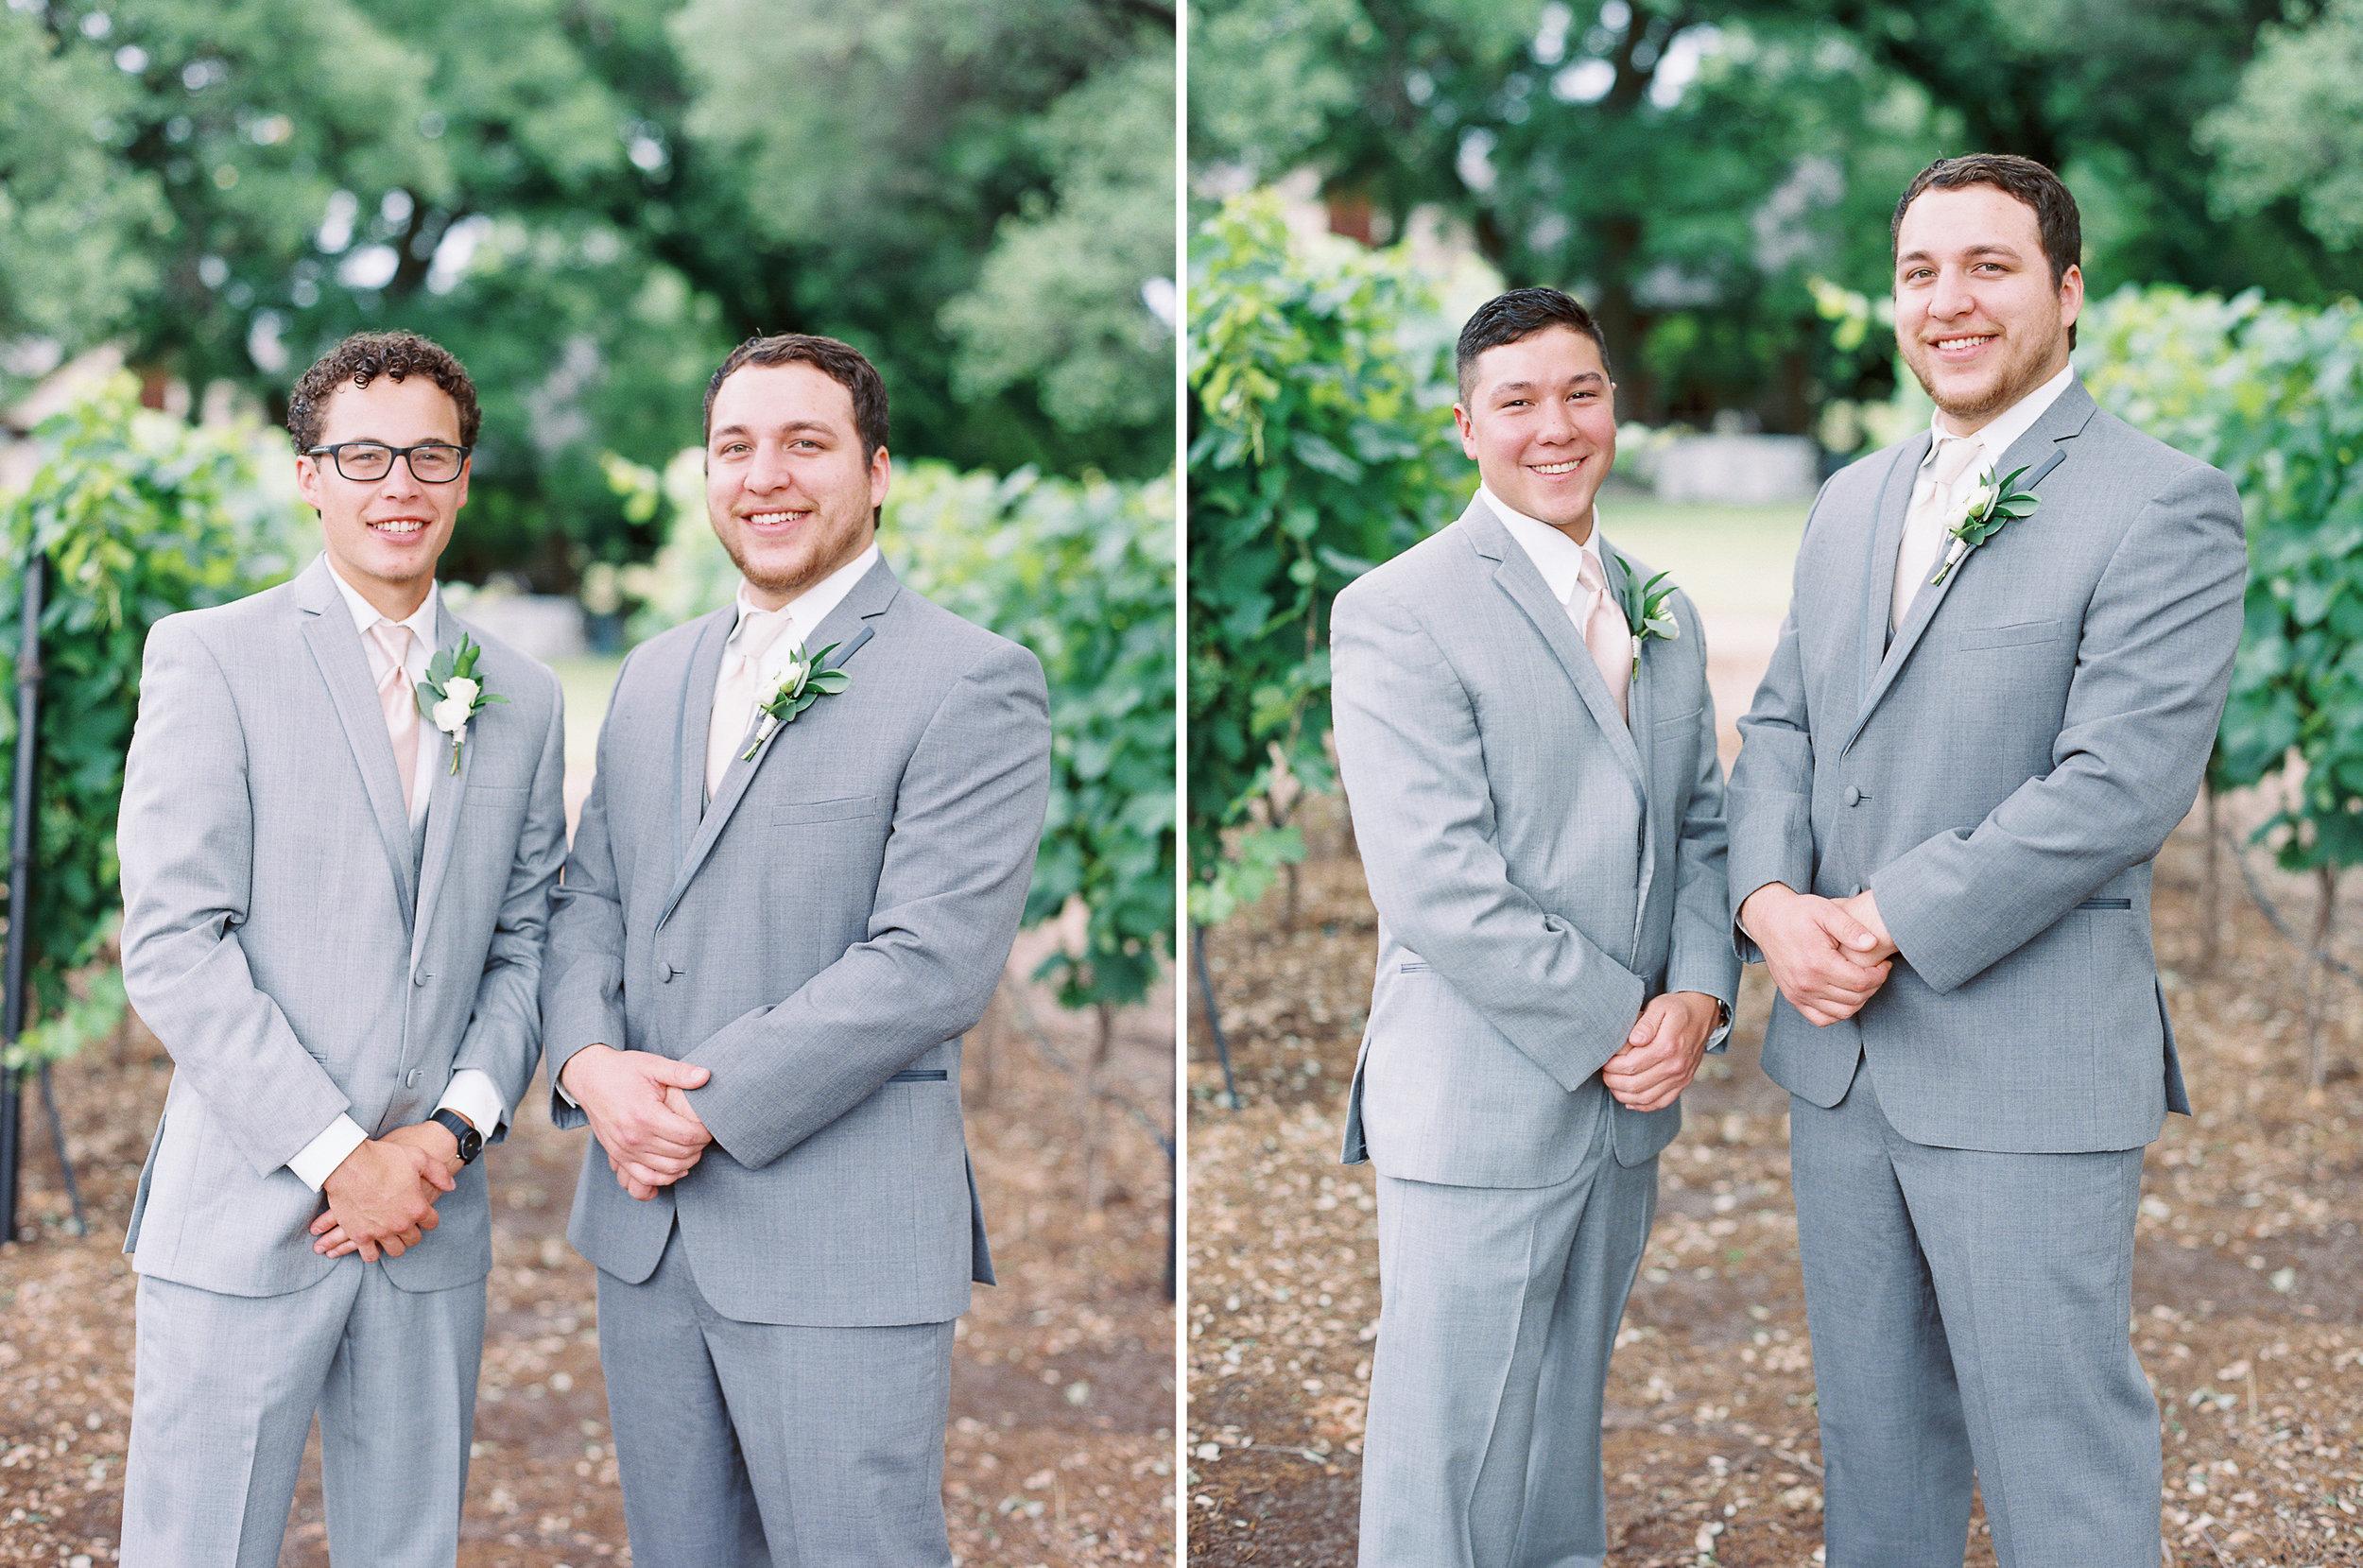 Elegant Spring Vineyard Wedding | Film Wedding Photographer | Austin Wedding Photographer | Groom and His Best Men | Britni Dean Photography // britnidean.com